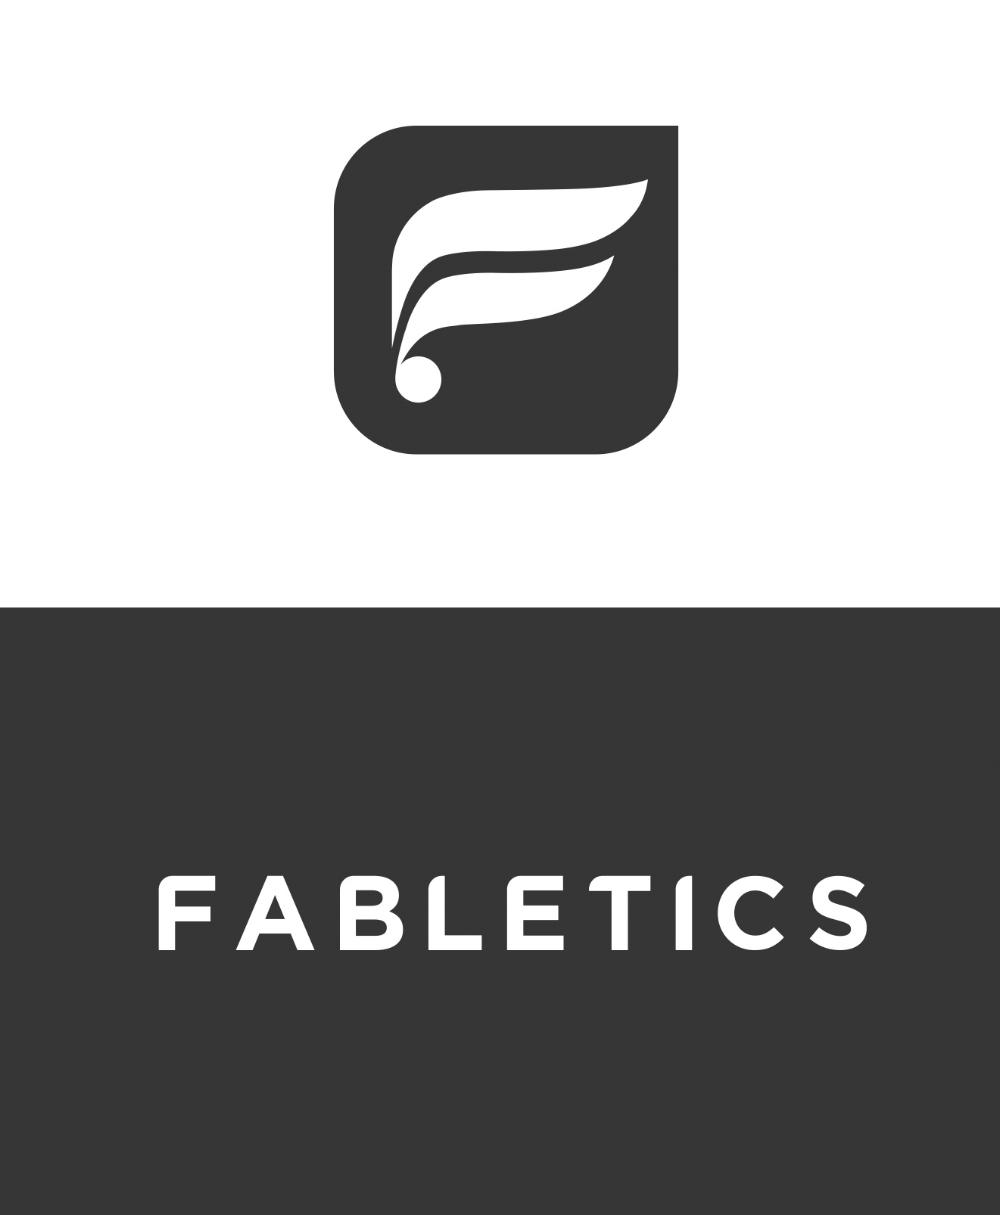 fabletics_logo_mock.jpg